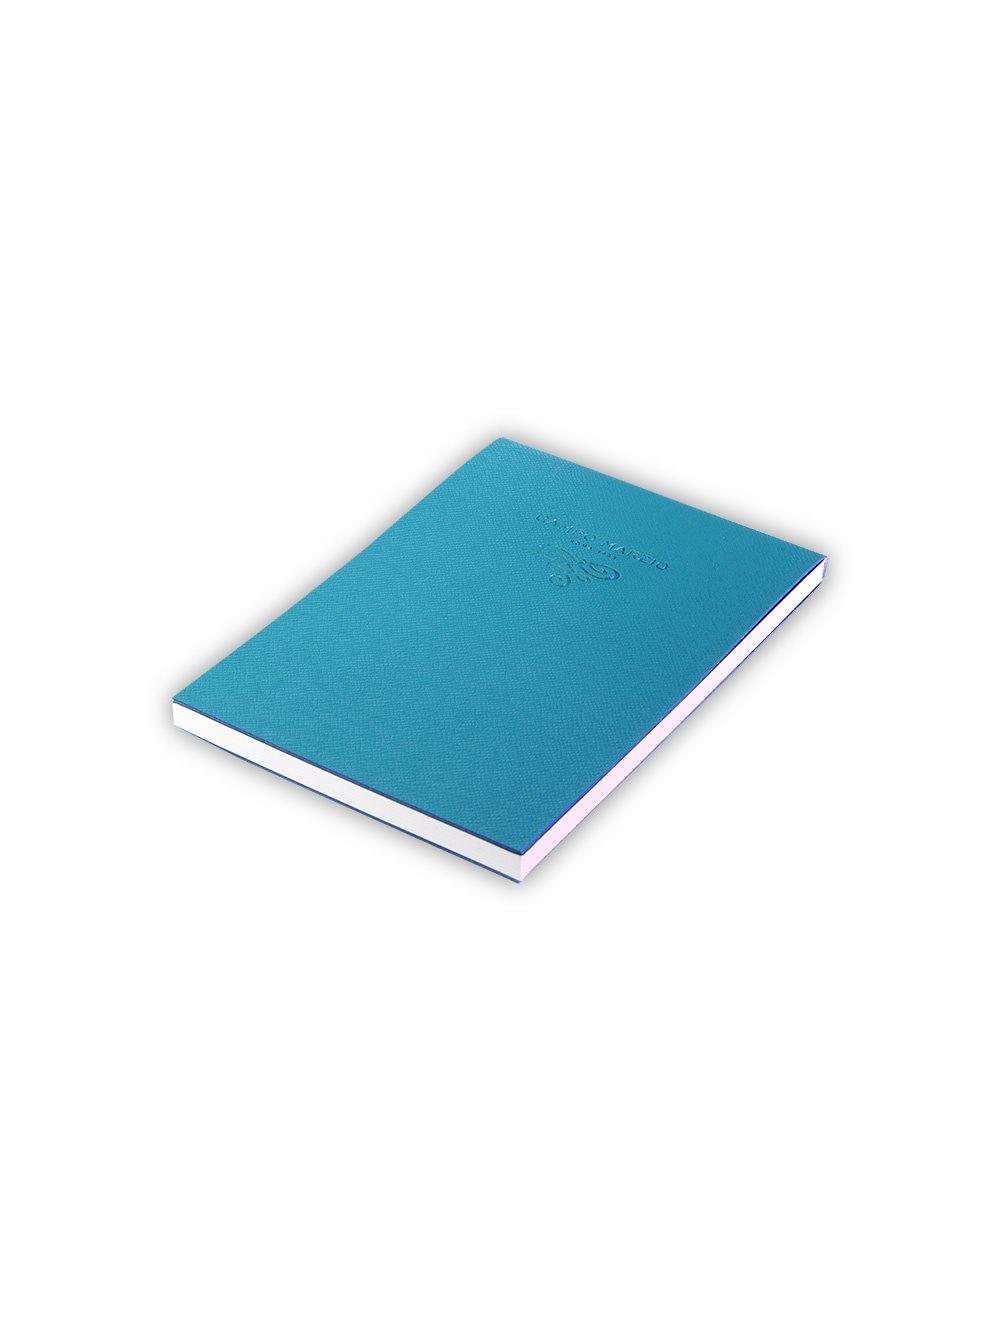 Notes 11x16 cm Saffiano (white internal paper) - Avion